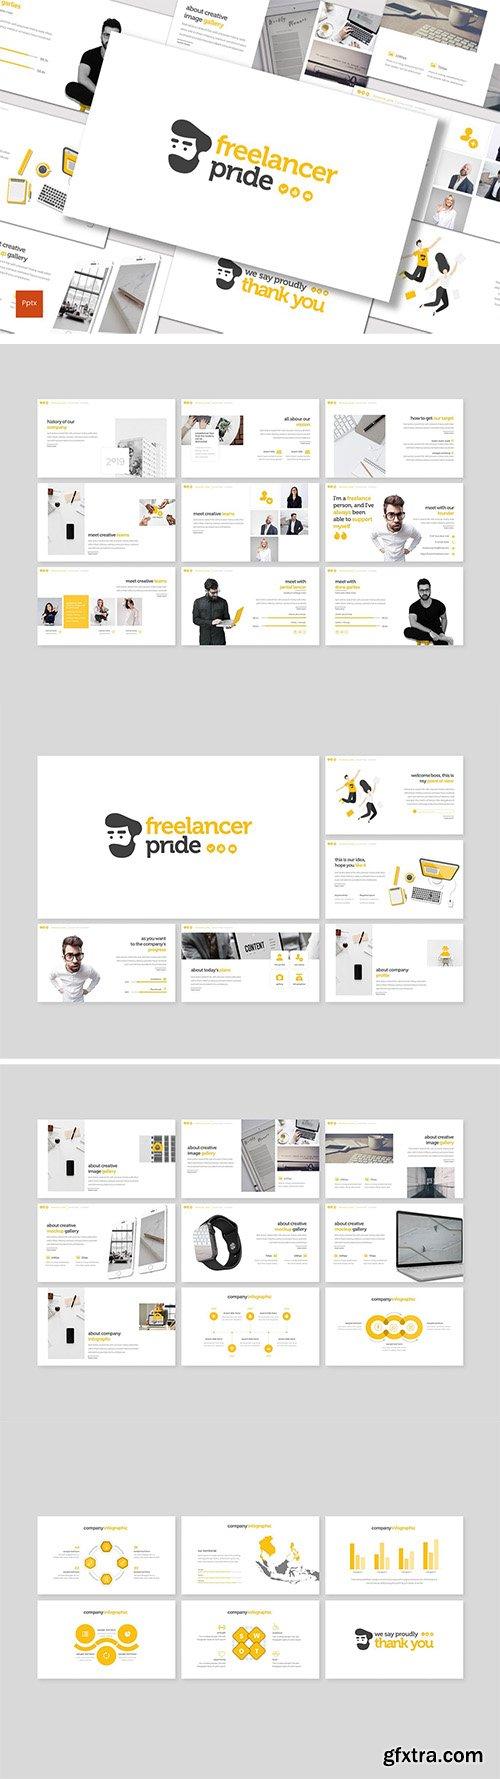 Freelancer Pride - Powerpoint Keynote and Google Slides Template